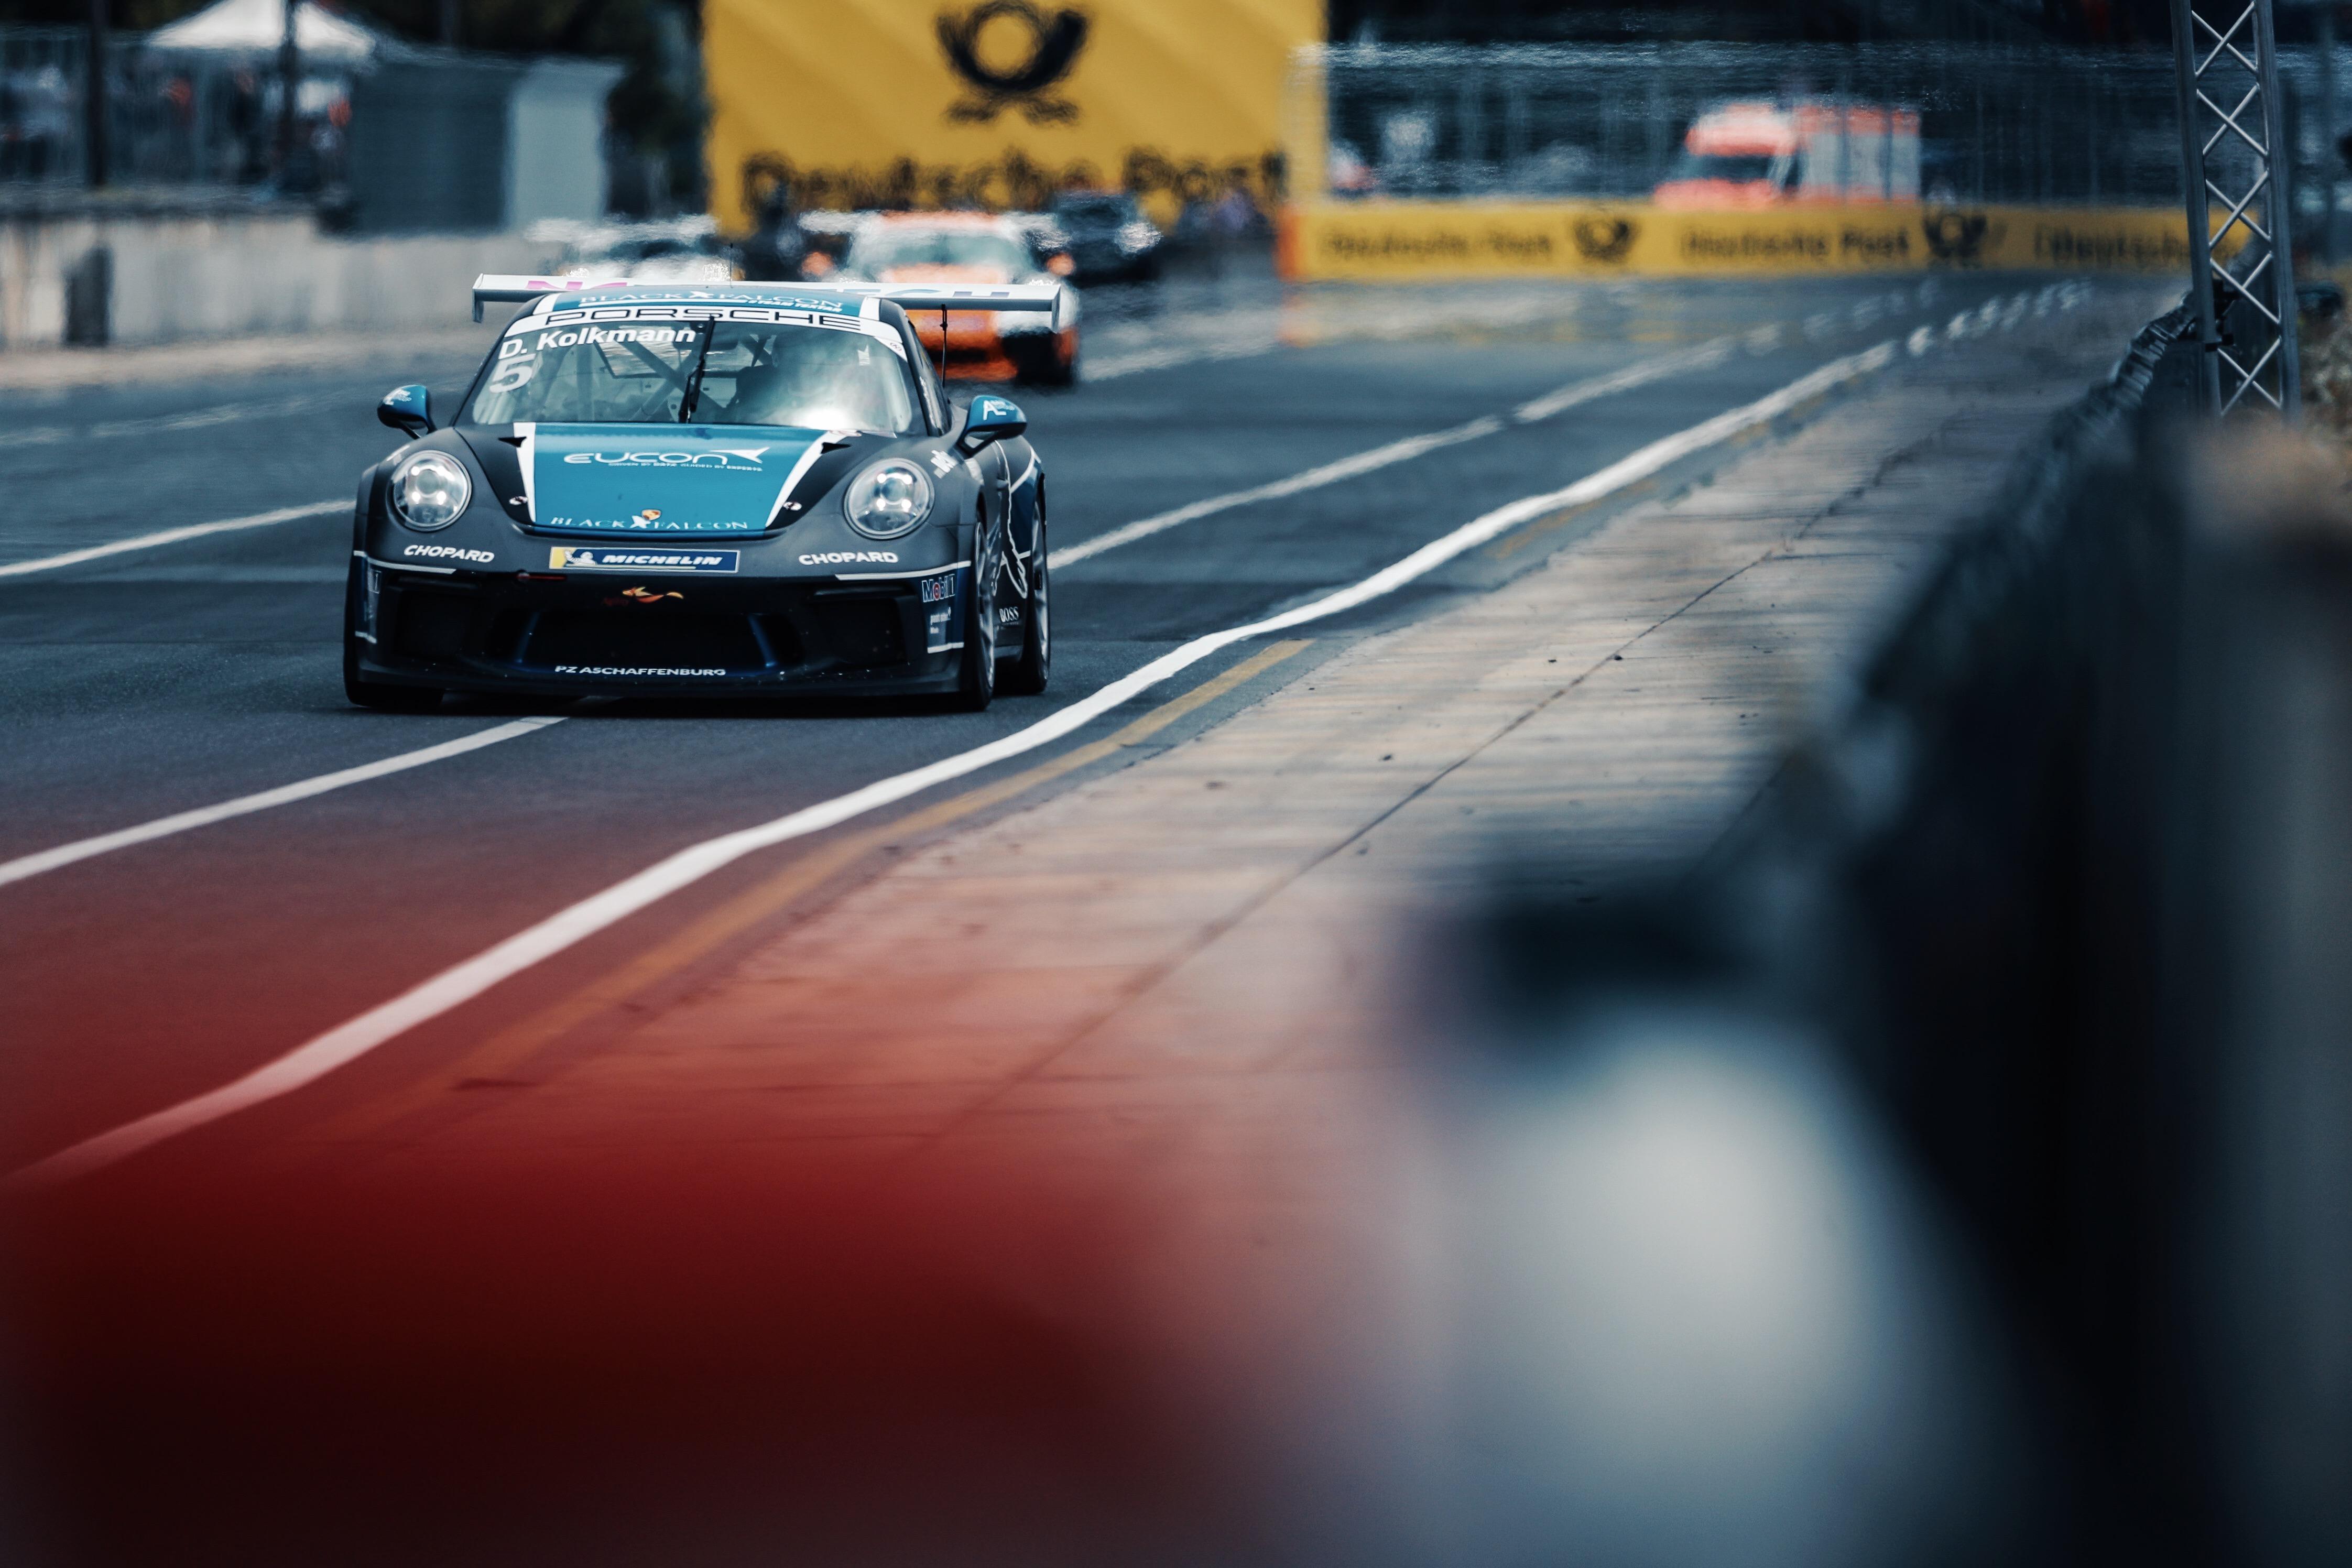 Porsche Carrera Cup Deutschland, 7. + 8. Lauf Norisring 2019 - Foto: Gruppe C Photography; #5 Porsche 911 GT3 Cup, BLACK FALCON: David Kolkmann Processed with VSCO with u3 preset